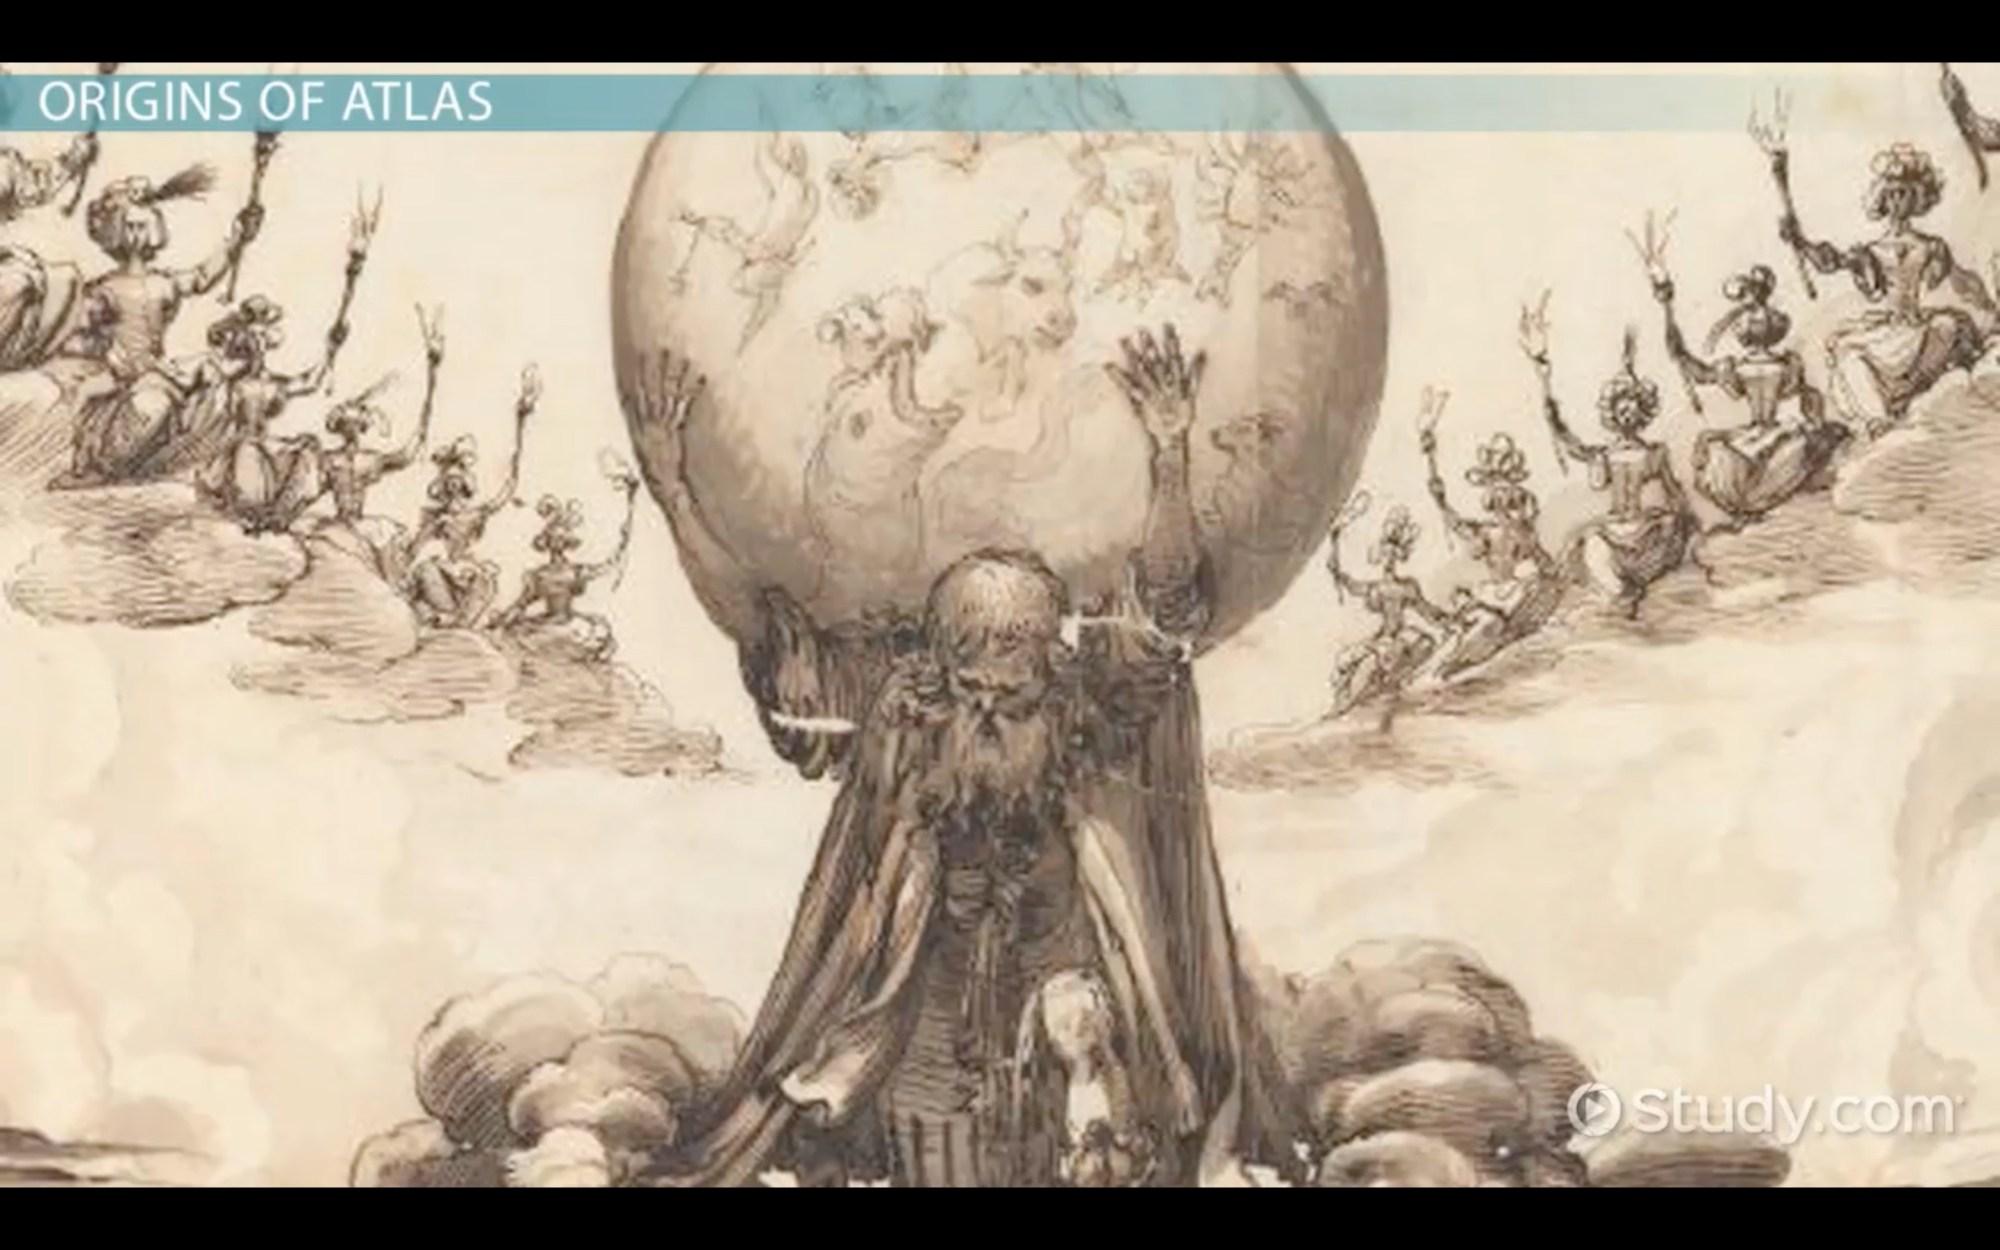 hight resolution of Atlas in Greek Mythology: Story \u0026 Facts - English Class (Video)   Study.com